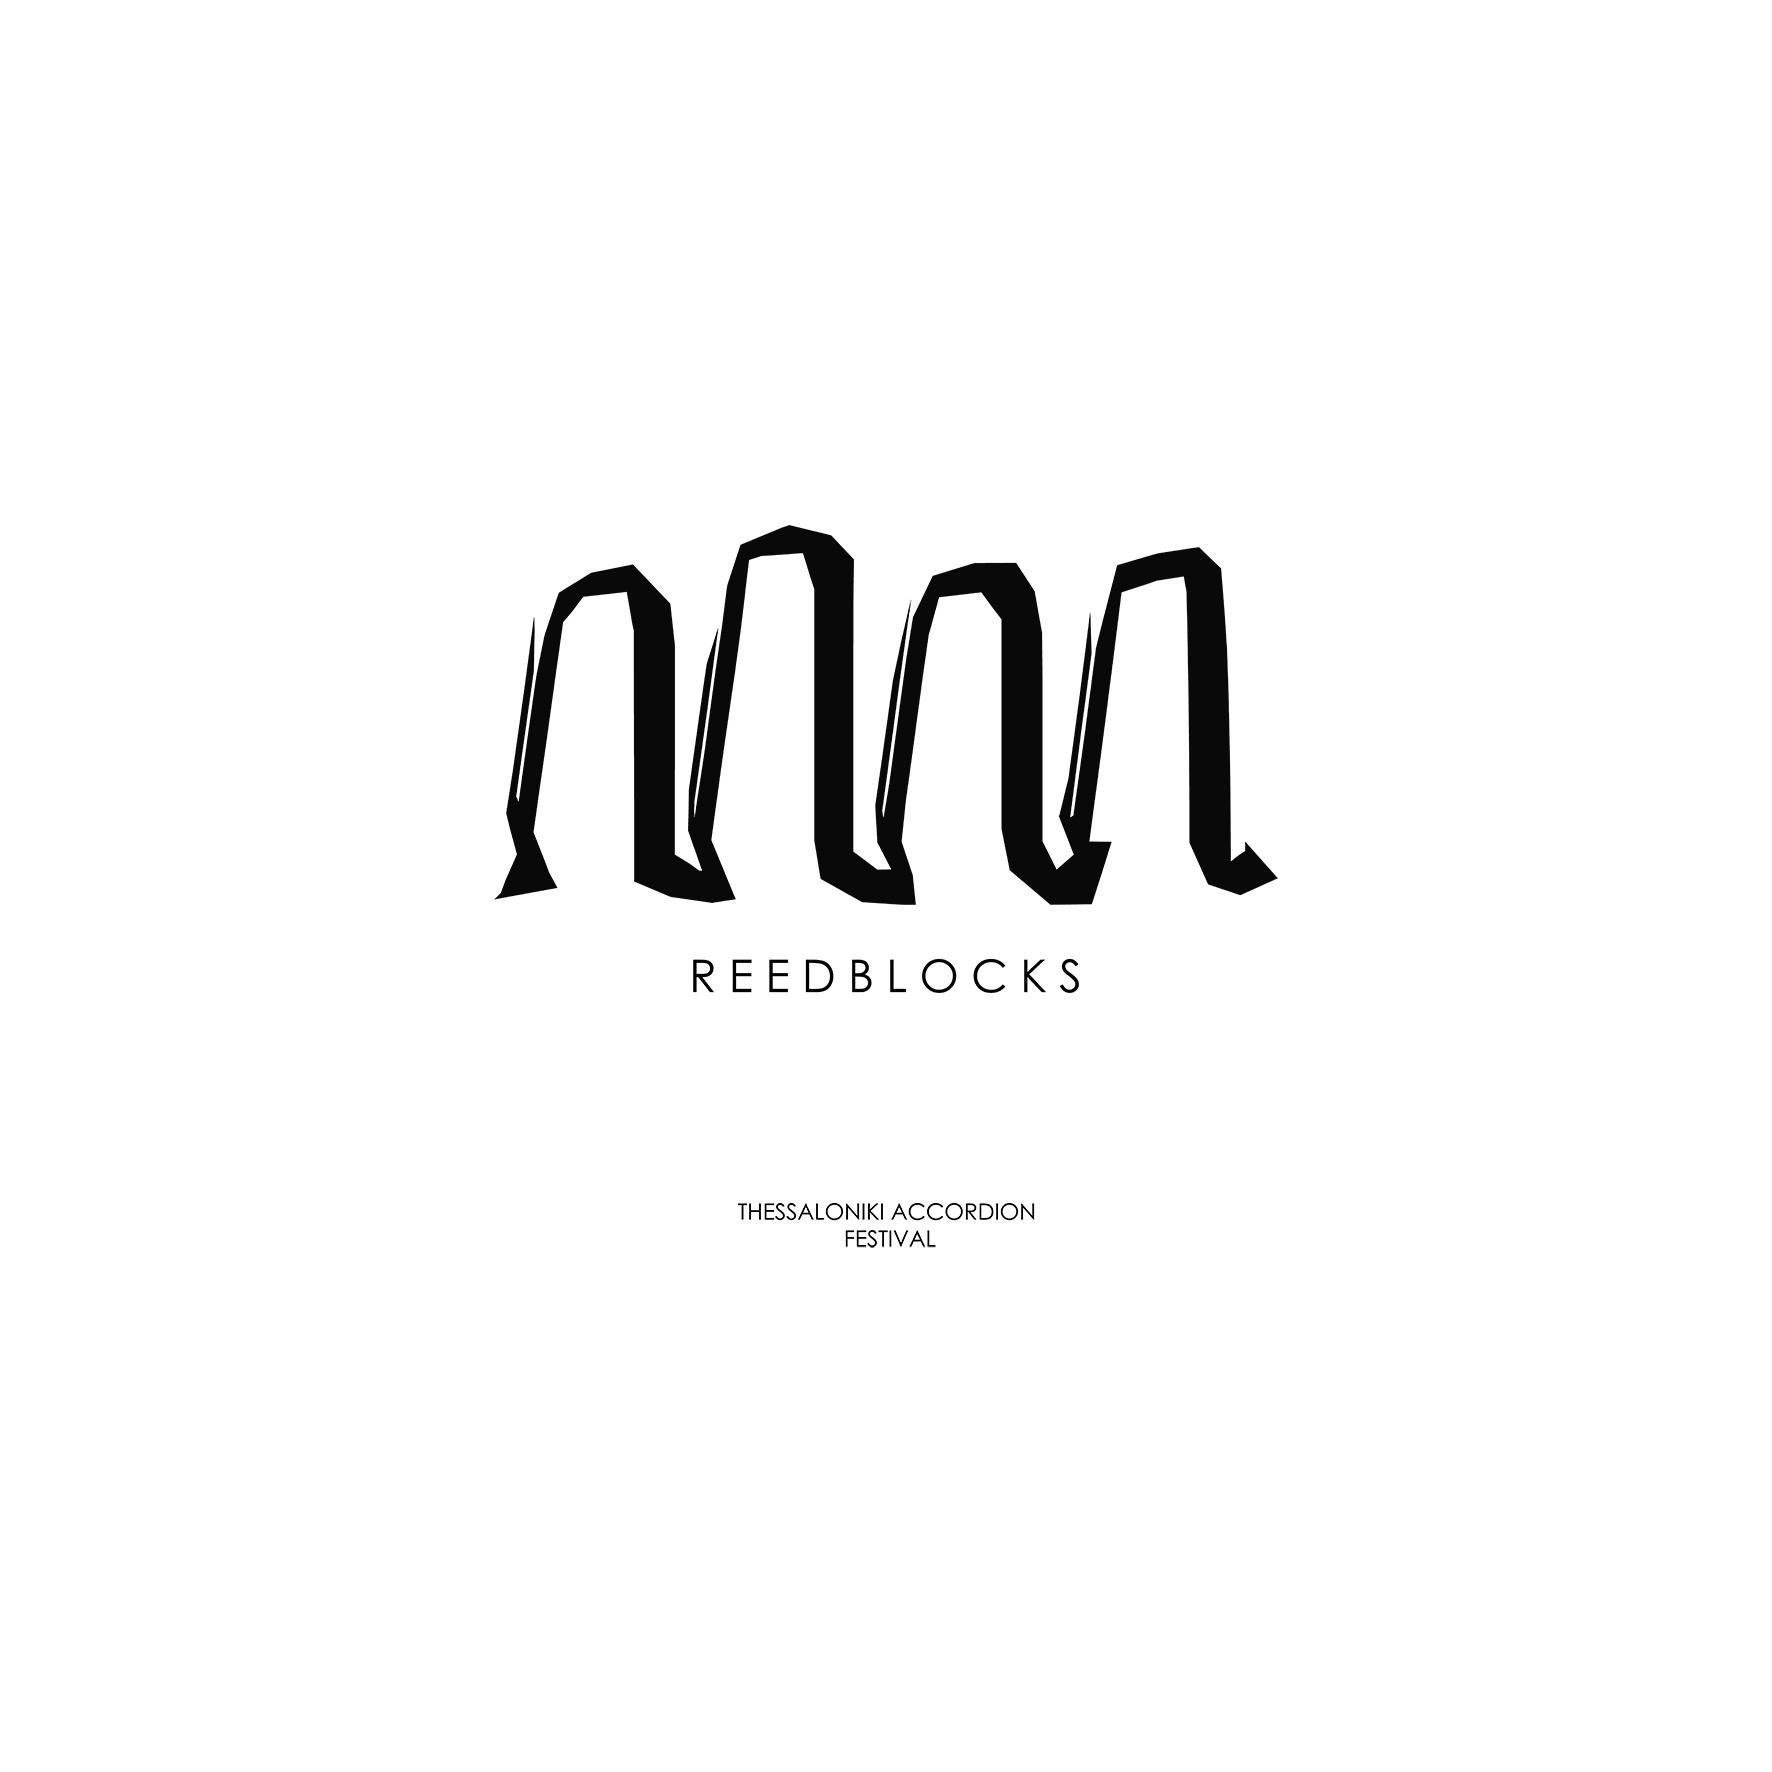 reedblocks logo.jpg